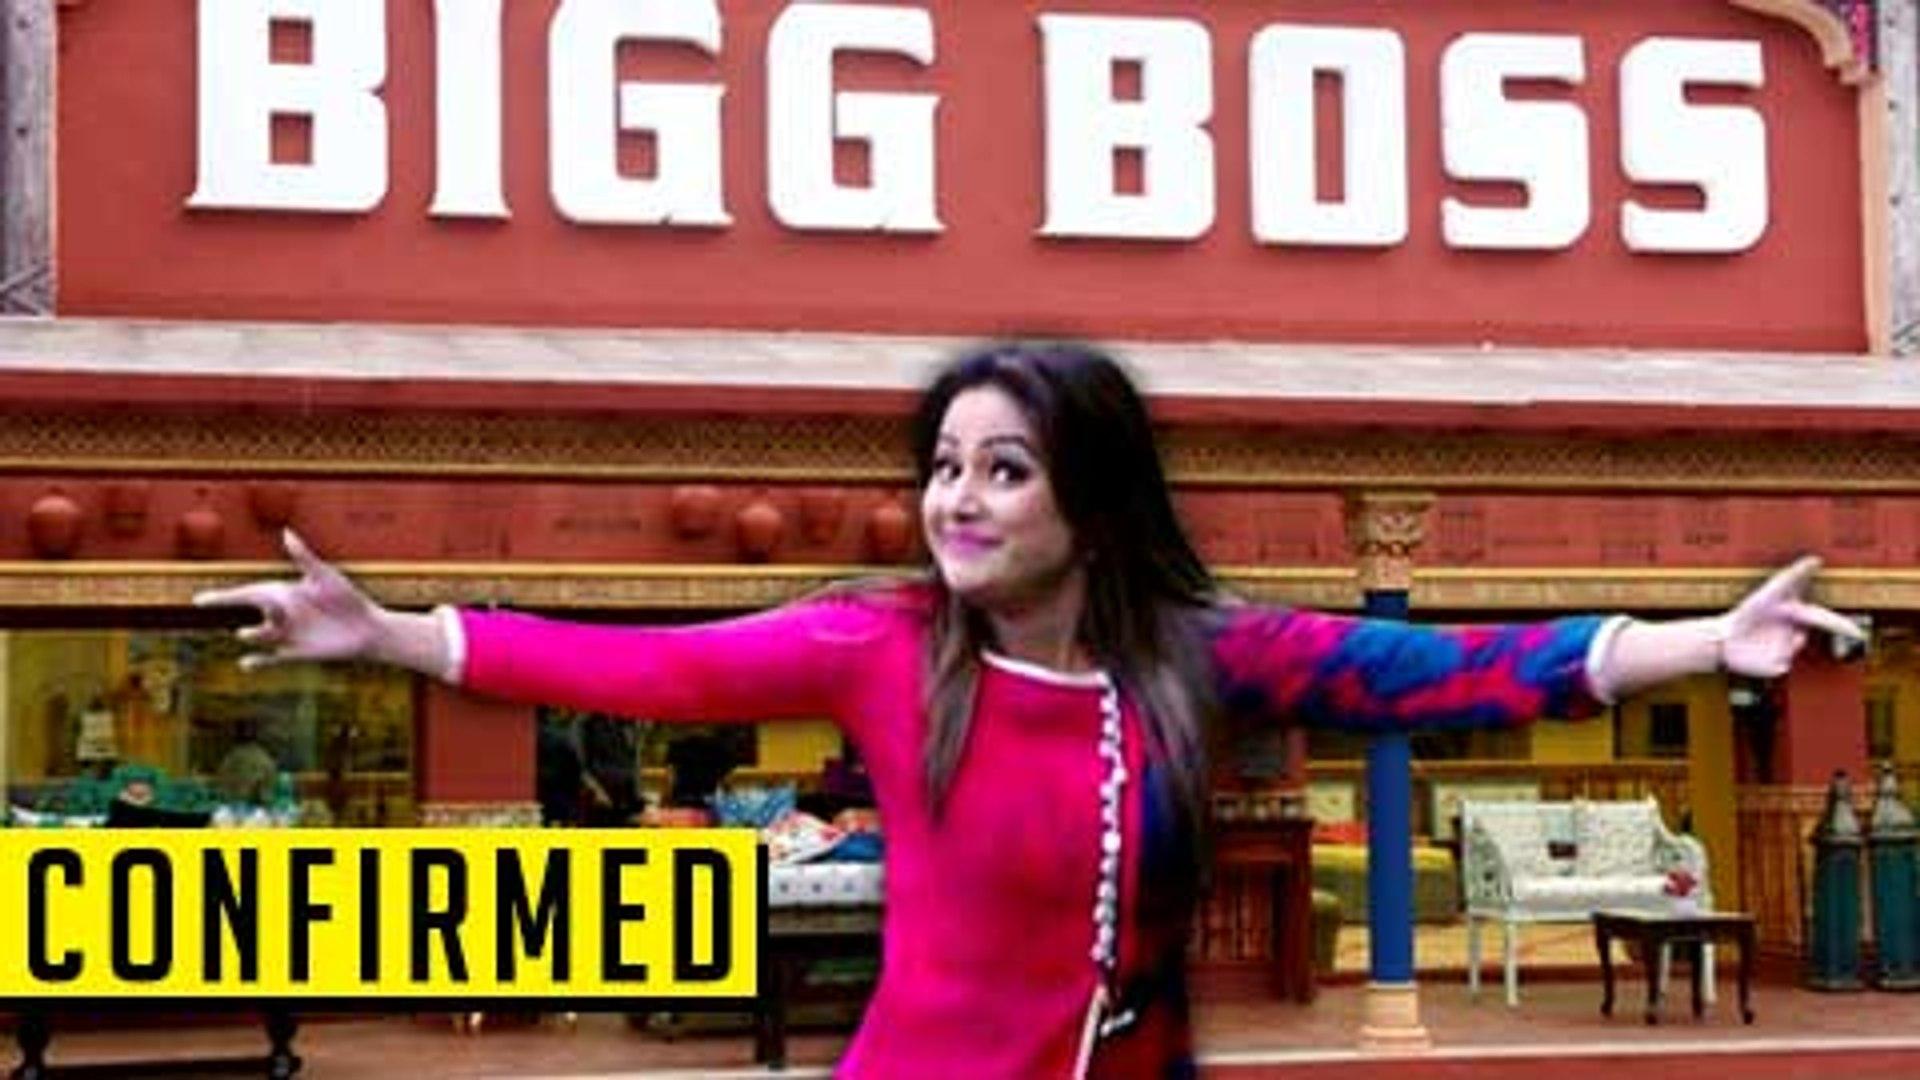 BIGG BOSS 10 | Hina Khan To Enter Bigg Boss House | CONFIRMED